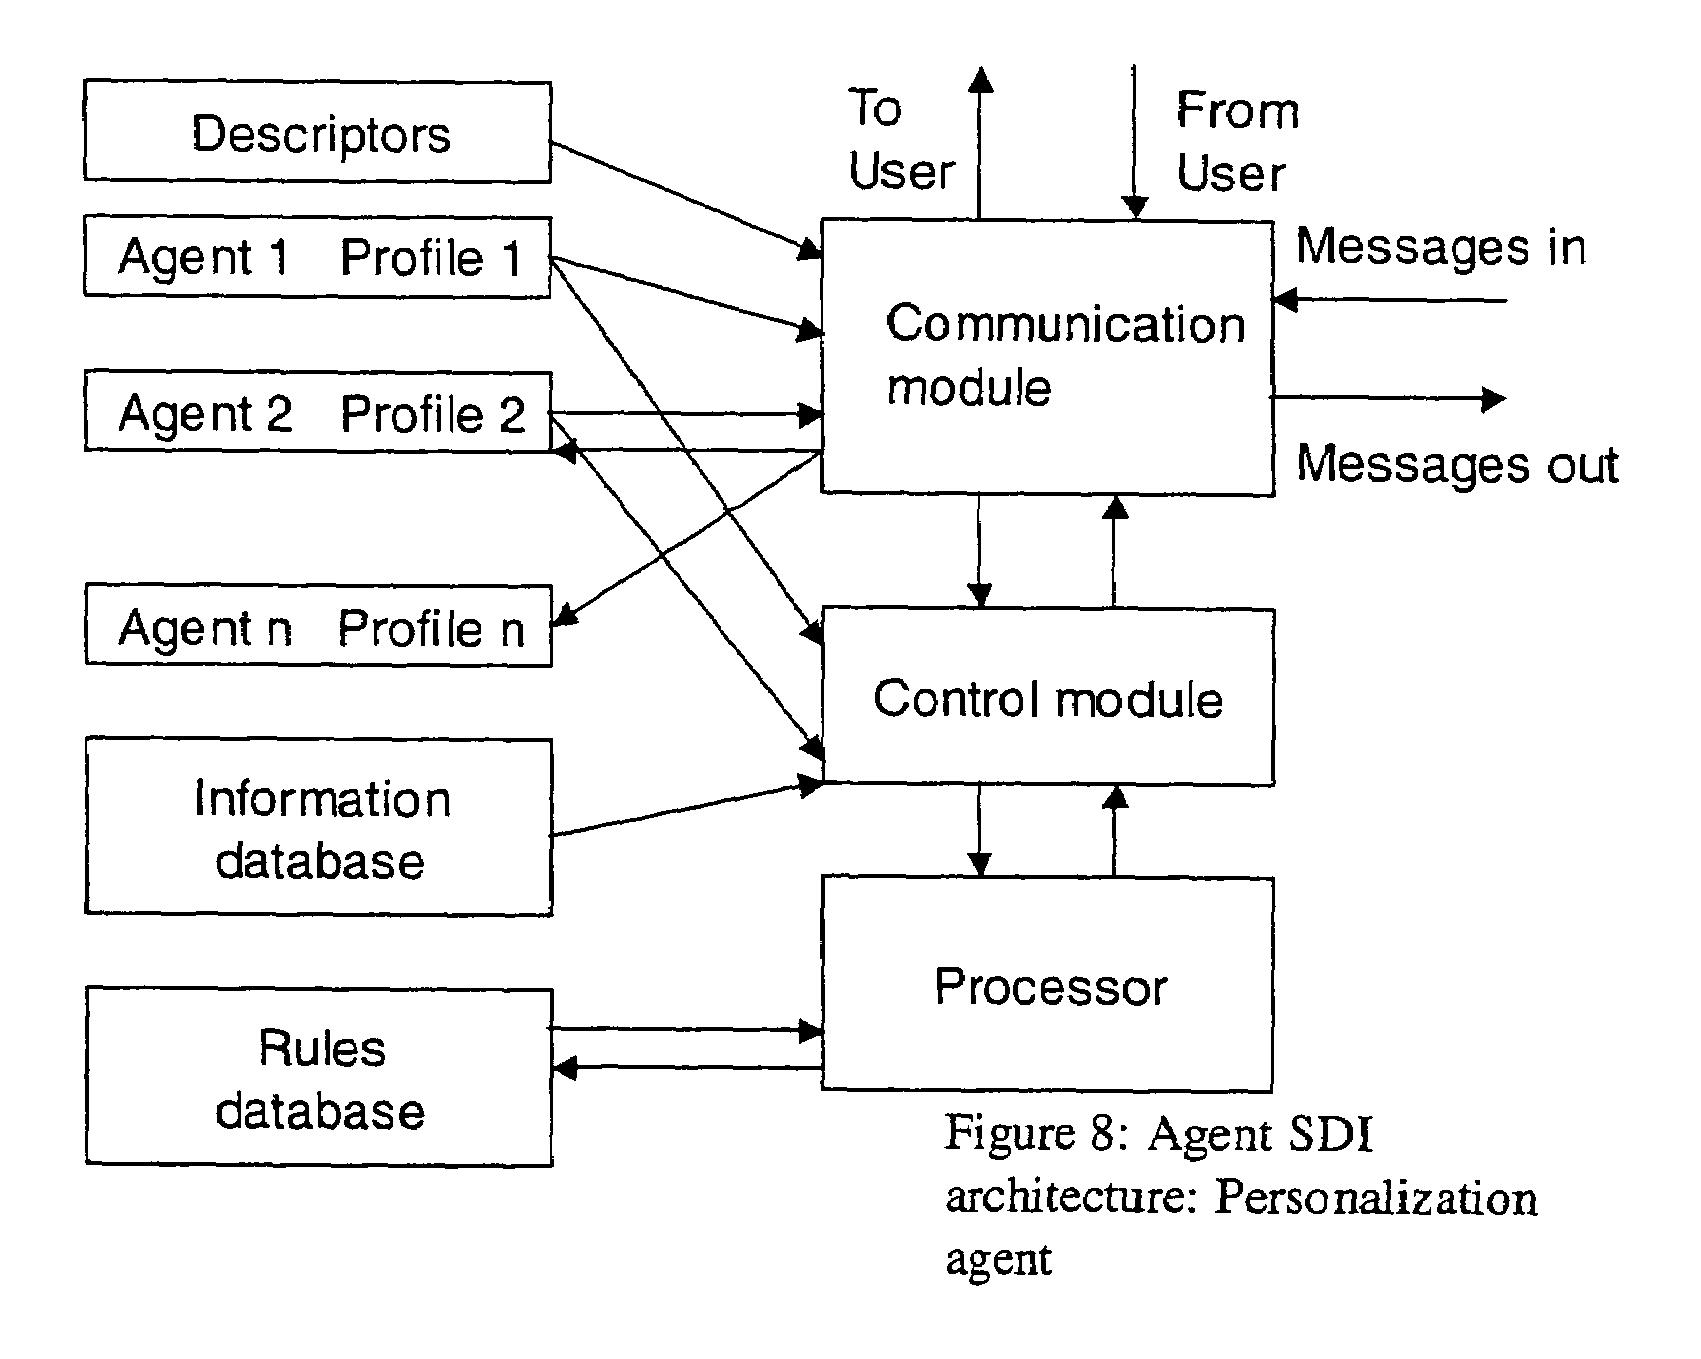 Patent US 7,630,986 B1